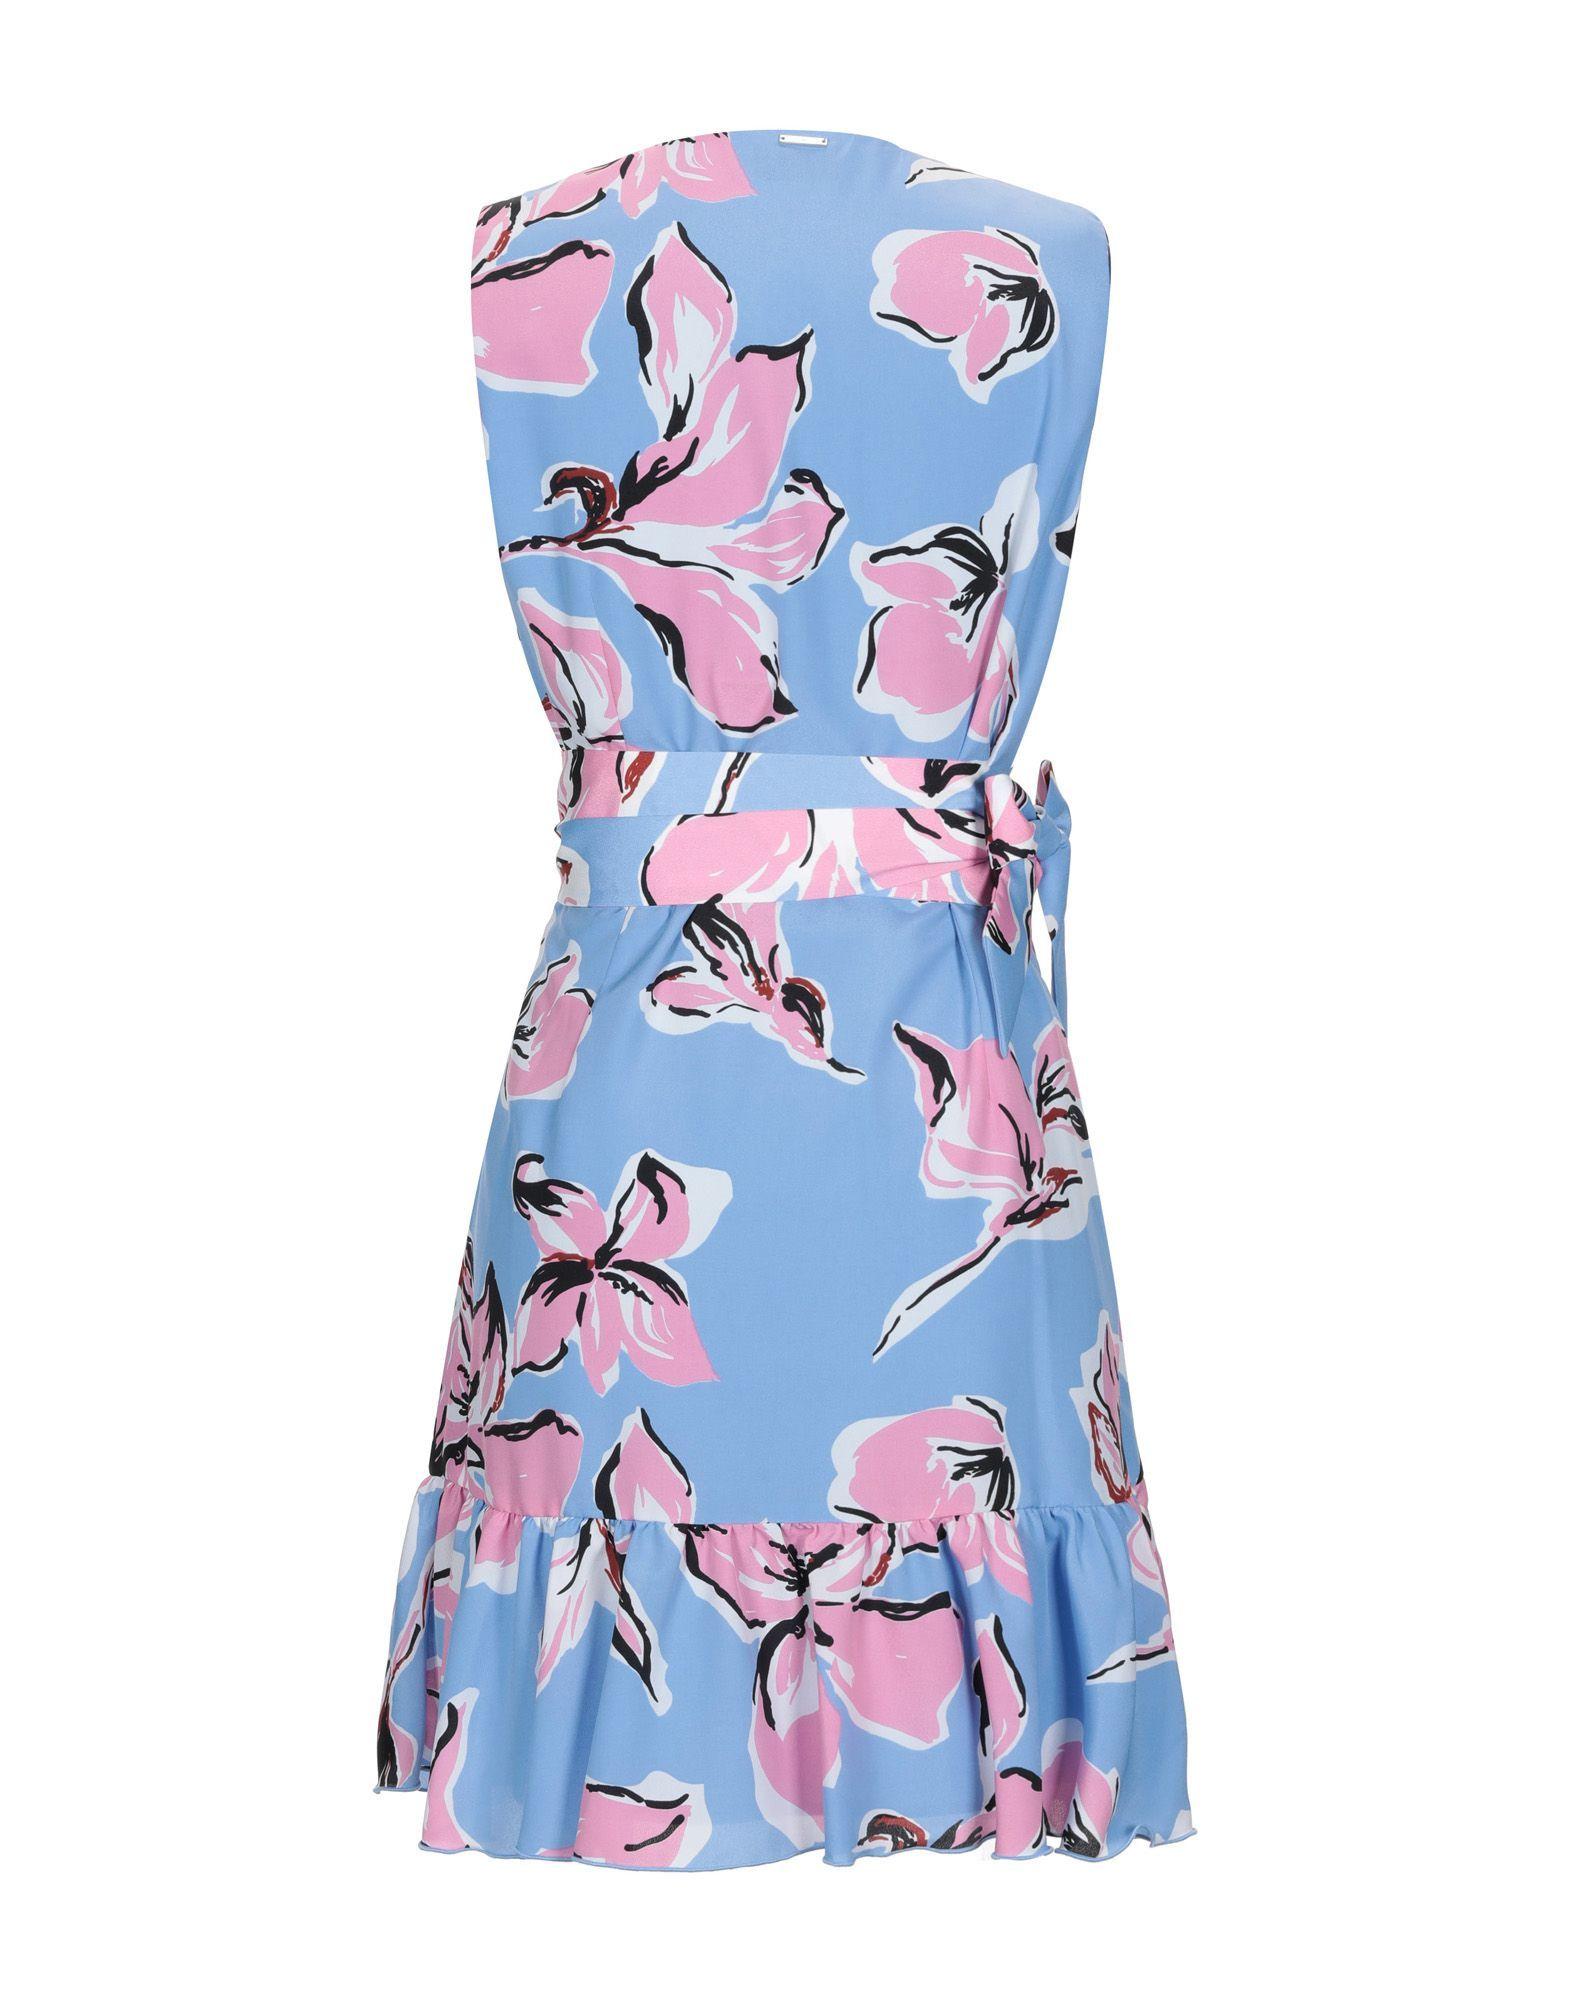 Liu Jo Sky Blue Print Short Dress